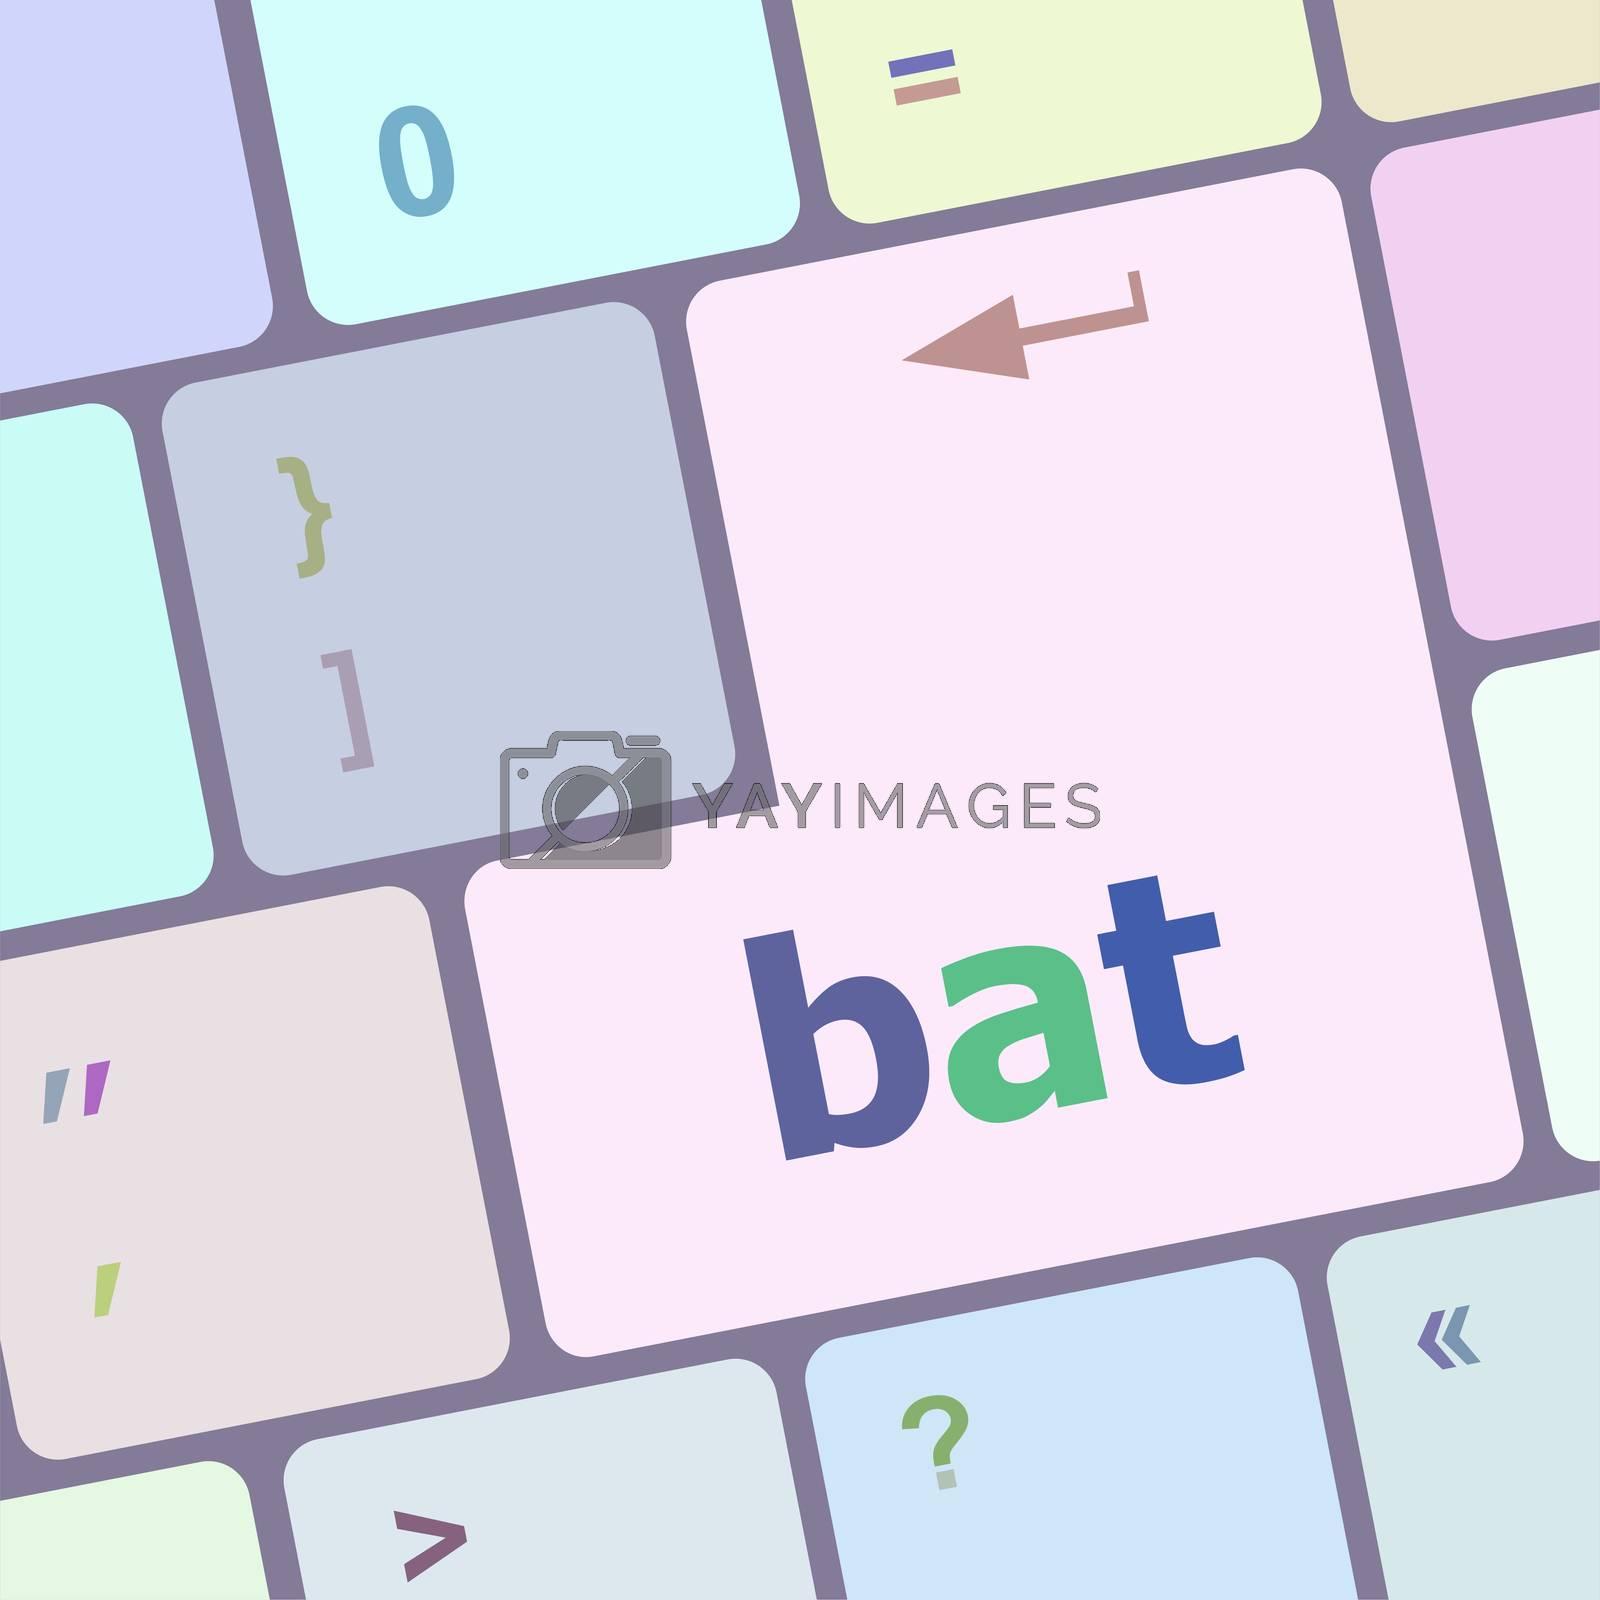 bat word on keyboard key, notebook computer